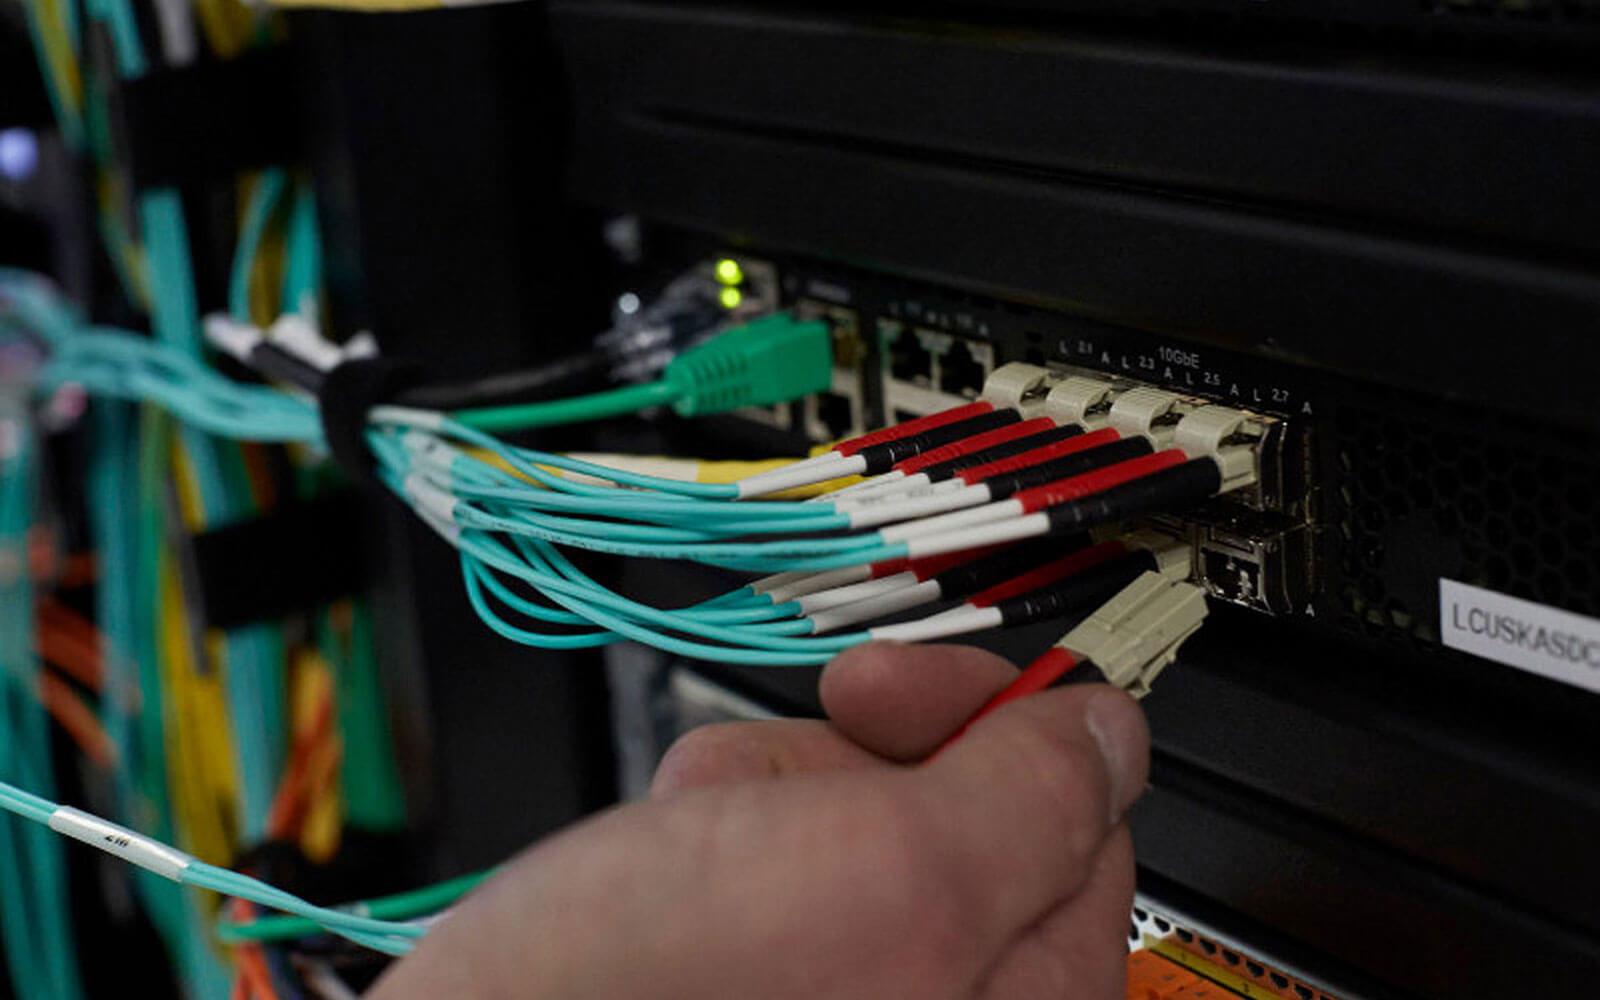 Iron Mountain Australia Records And Data Management Shredding Australian Wiring Regulations Book Vault Services